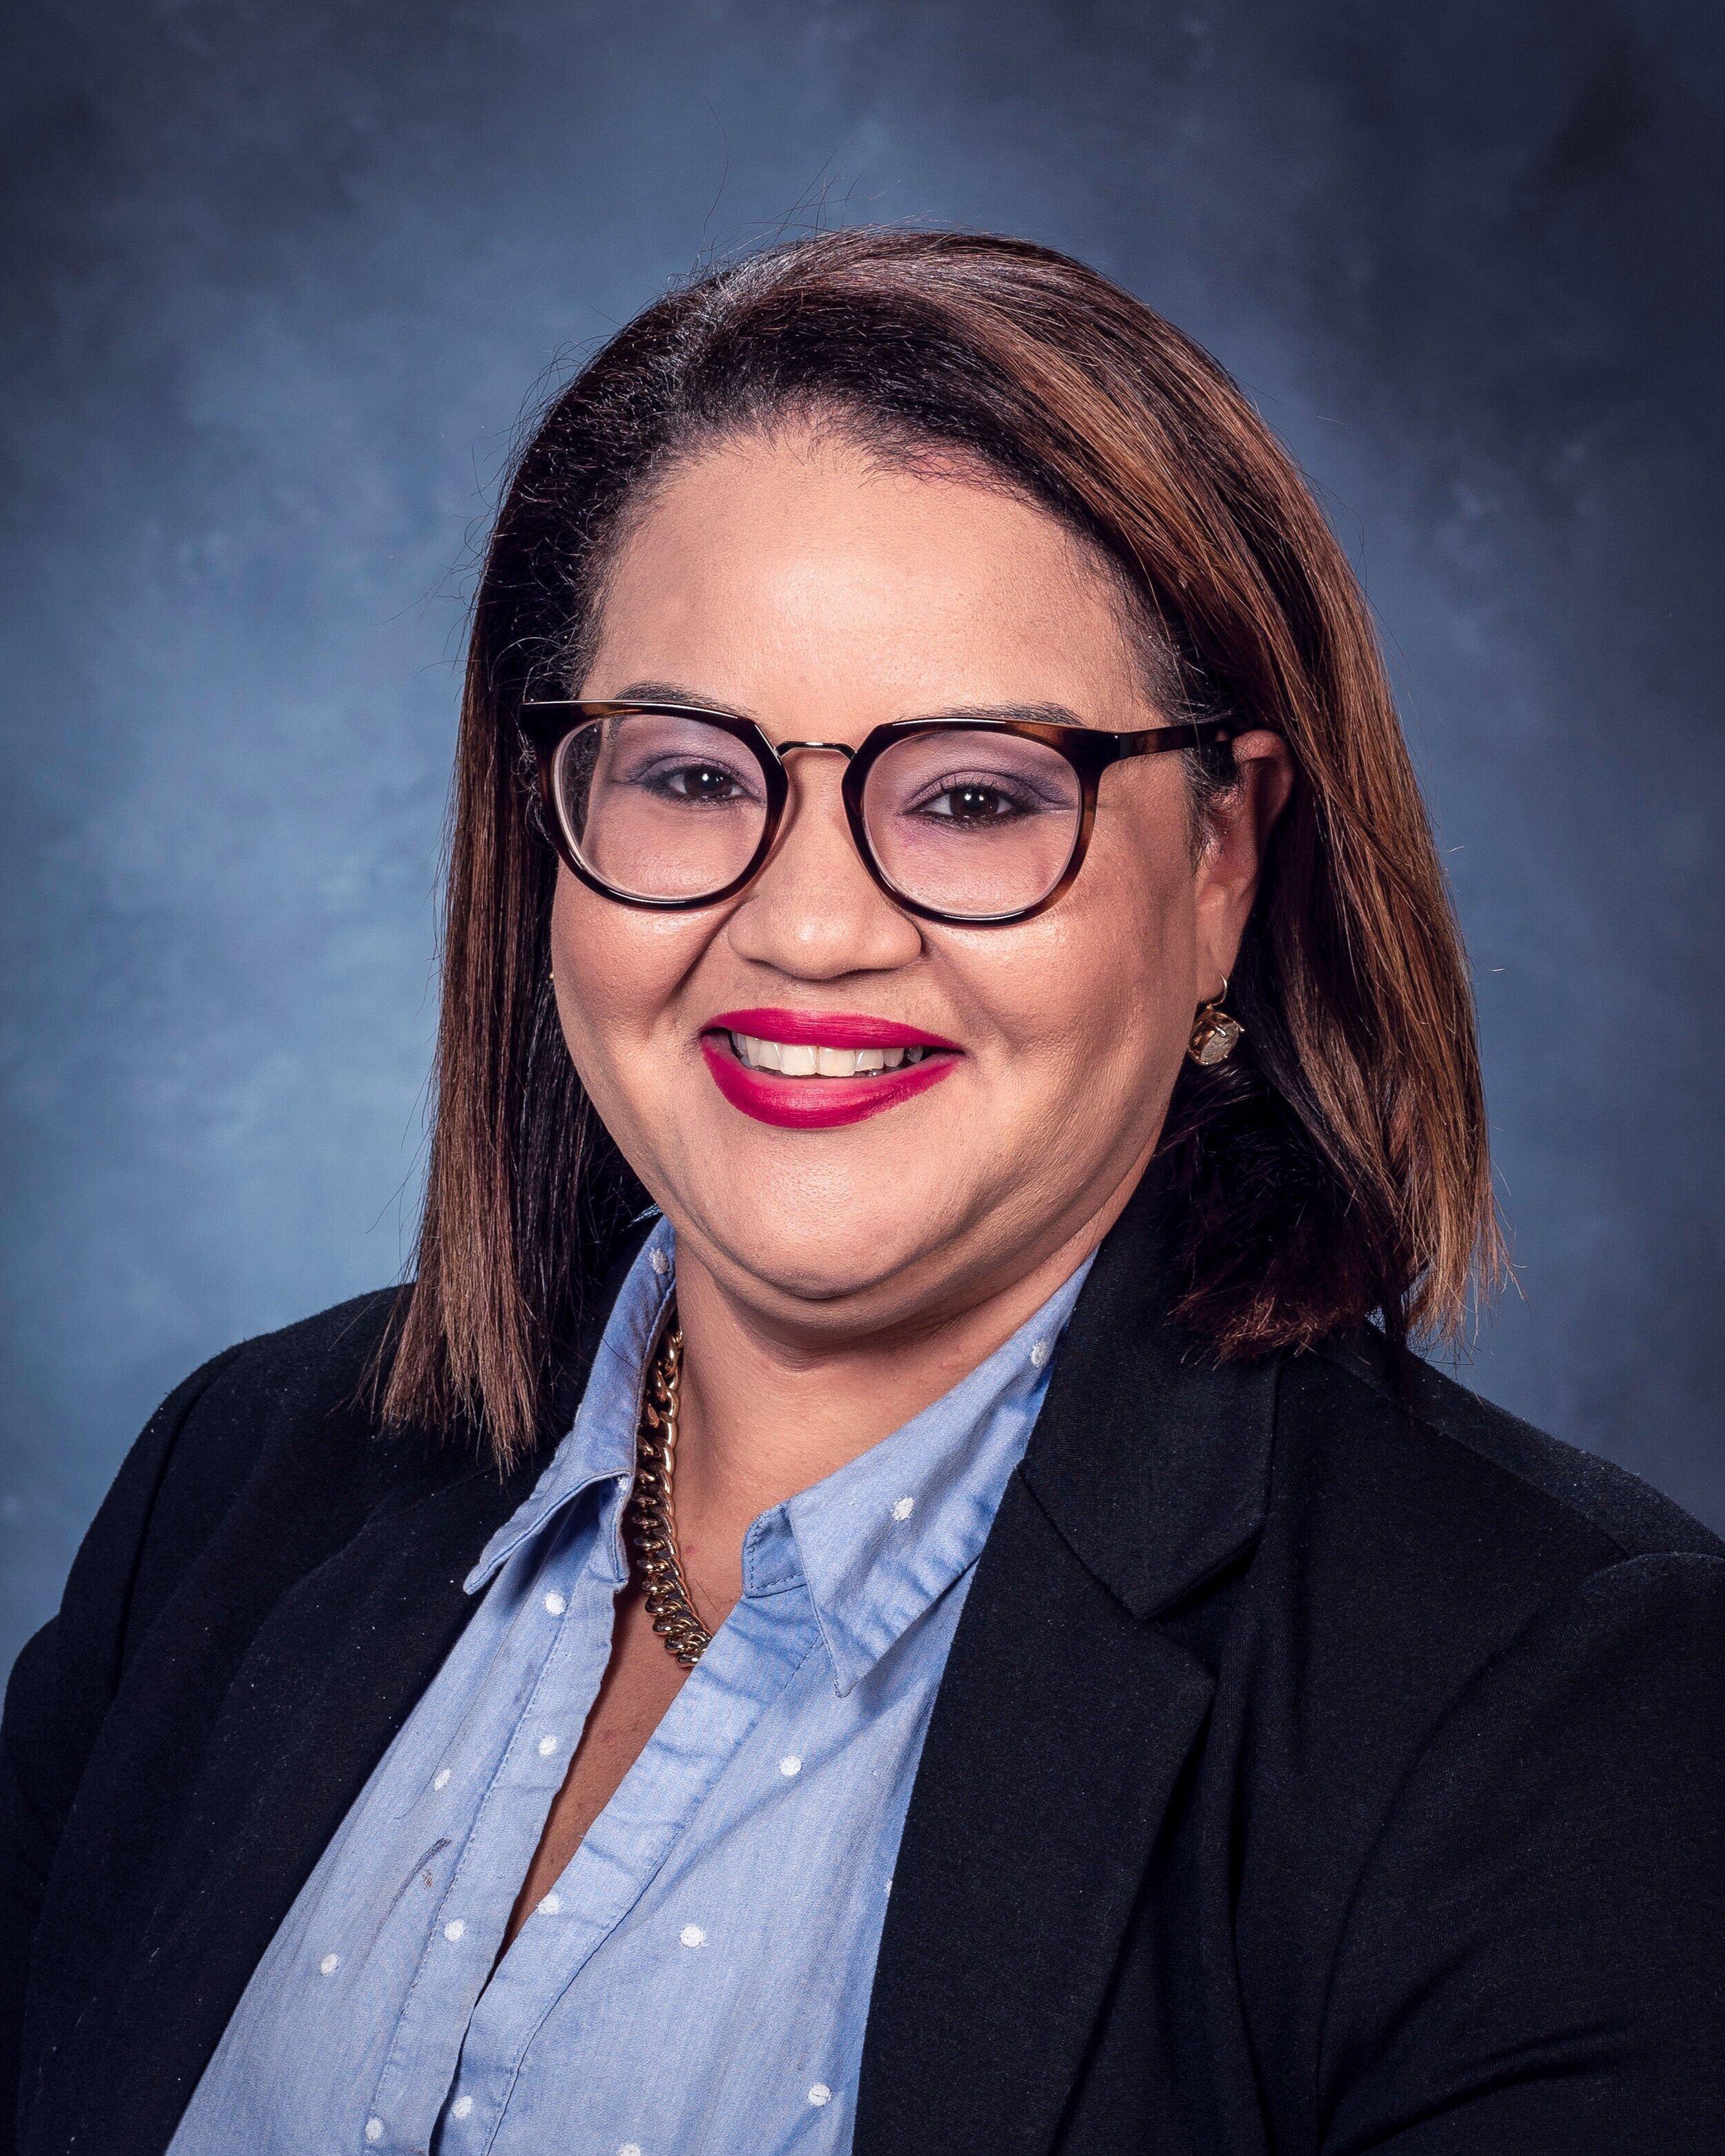 Dionne M. Hernandez-Lugo, Ph.D. - Deputy Manager, Kilopower ProjectSpace Technology Project Office, Space Flight Systems DirectorateNASA Glenn Research Center